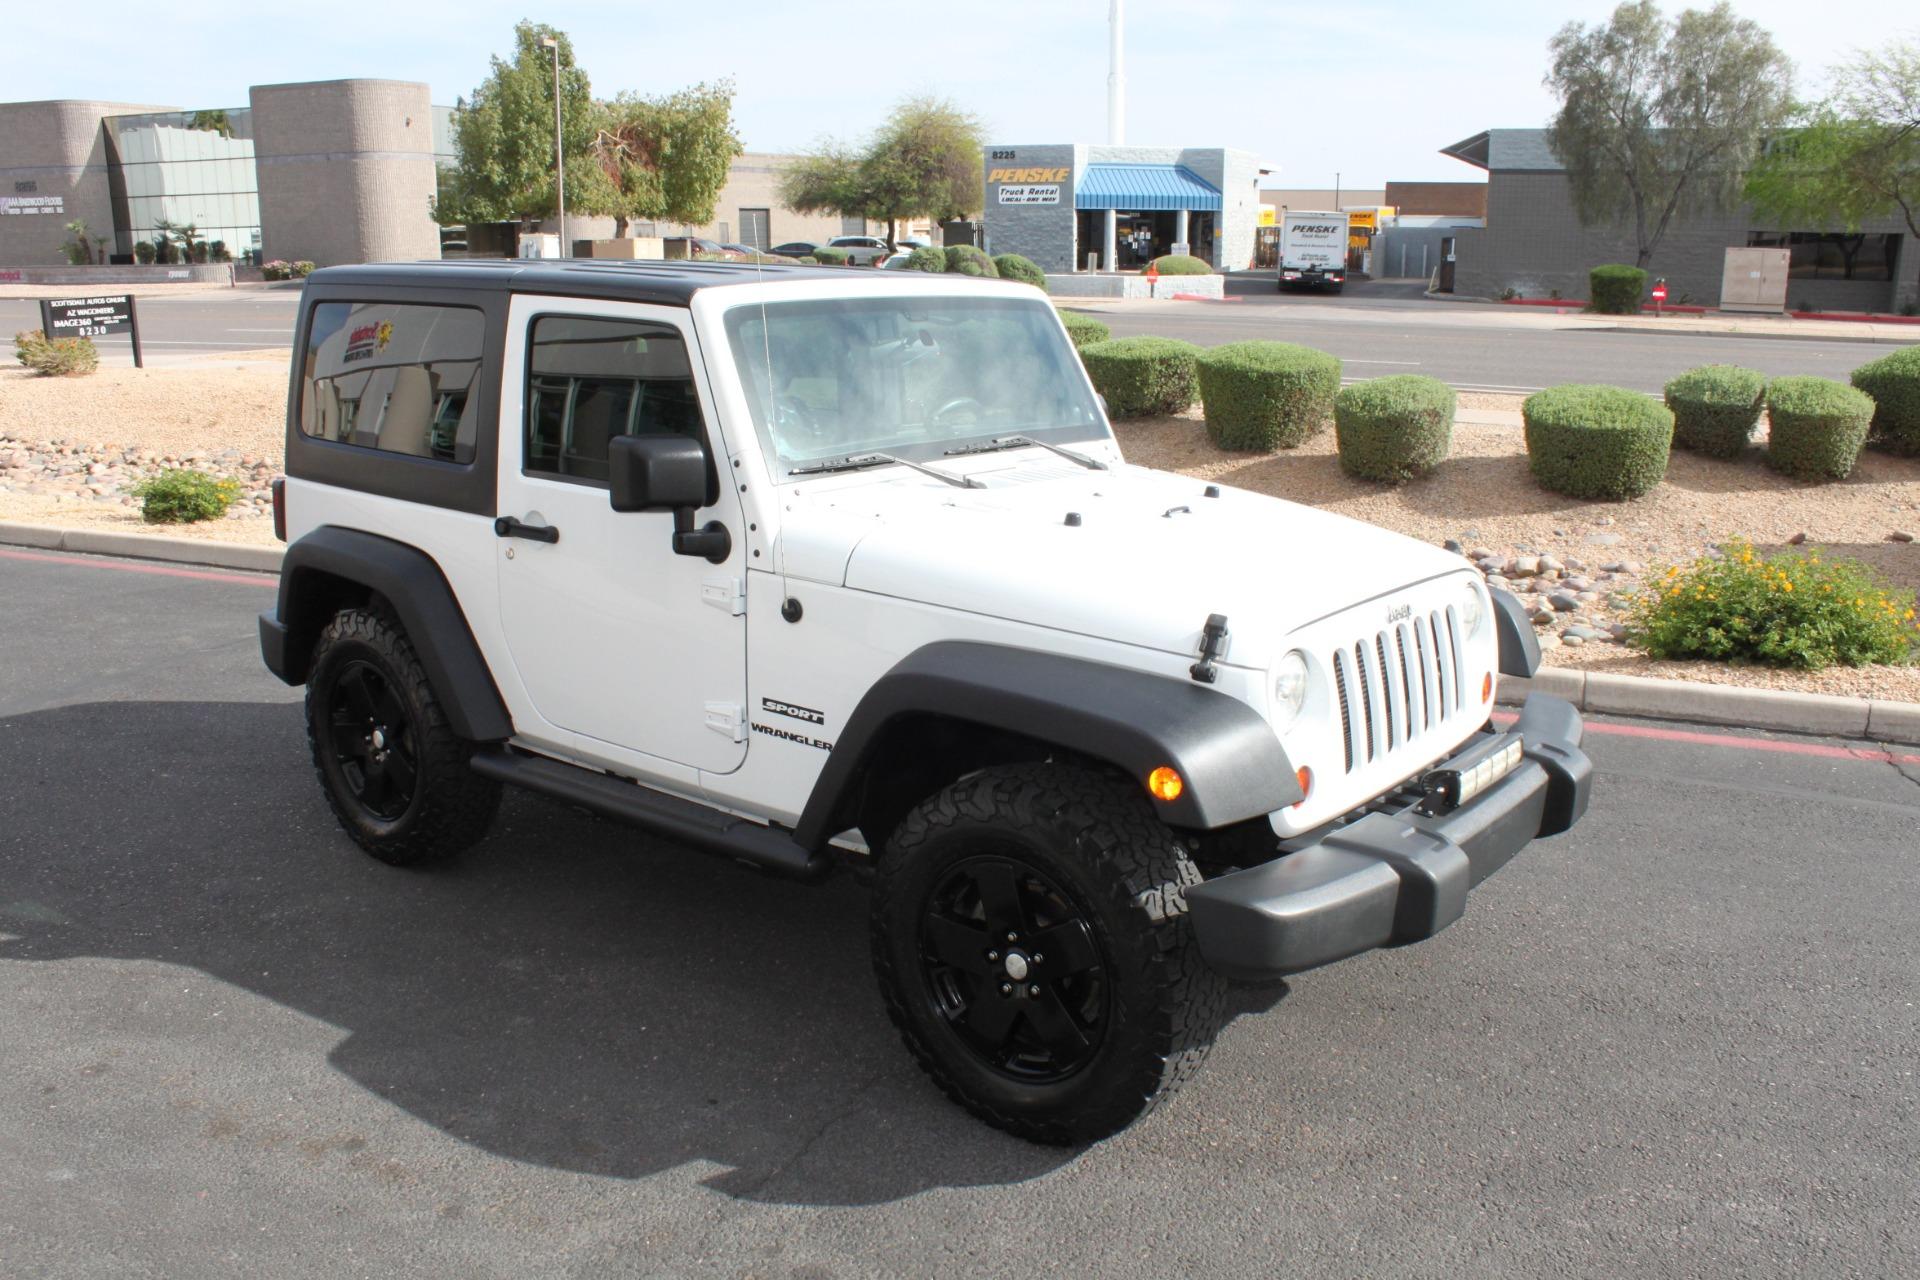 Used-2012-Jeep-Wrangler-Freedom-Edition-4X4-Camaro